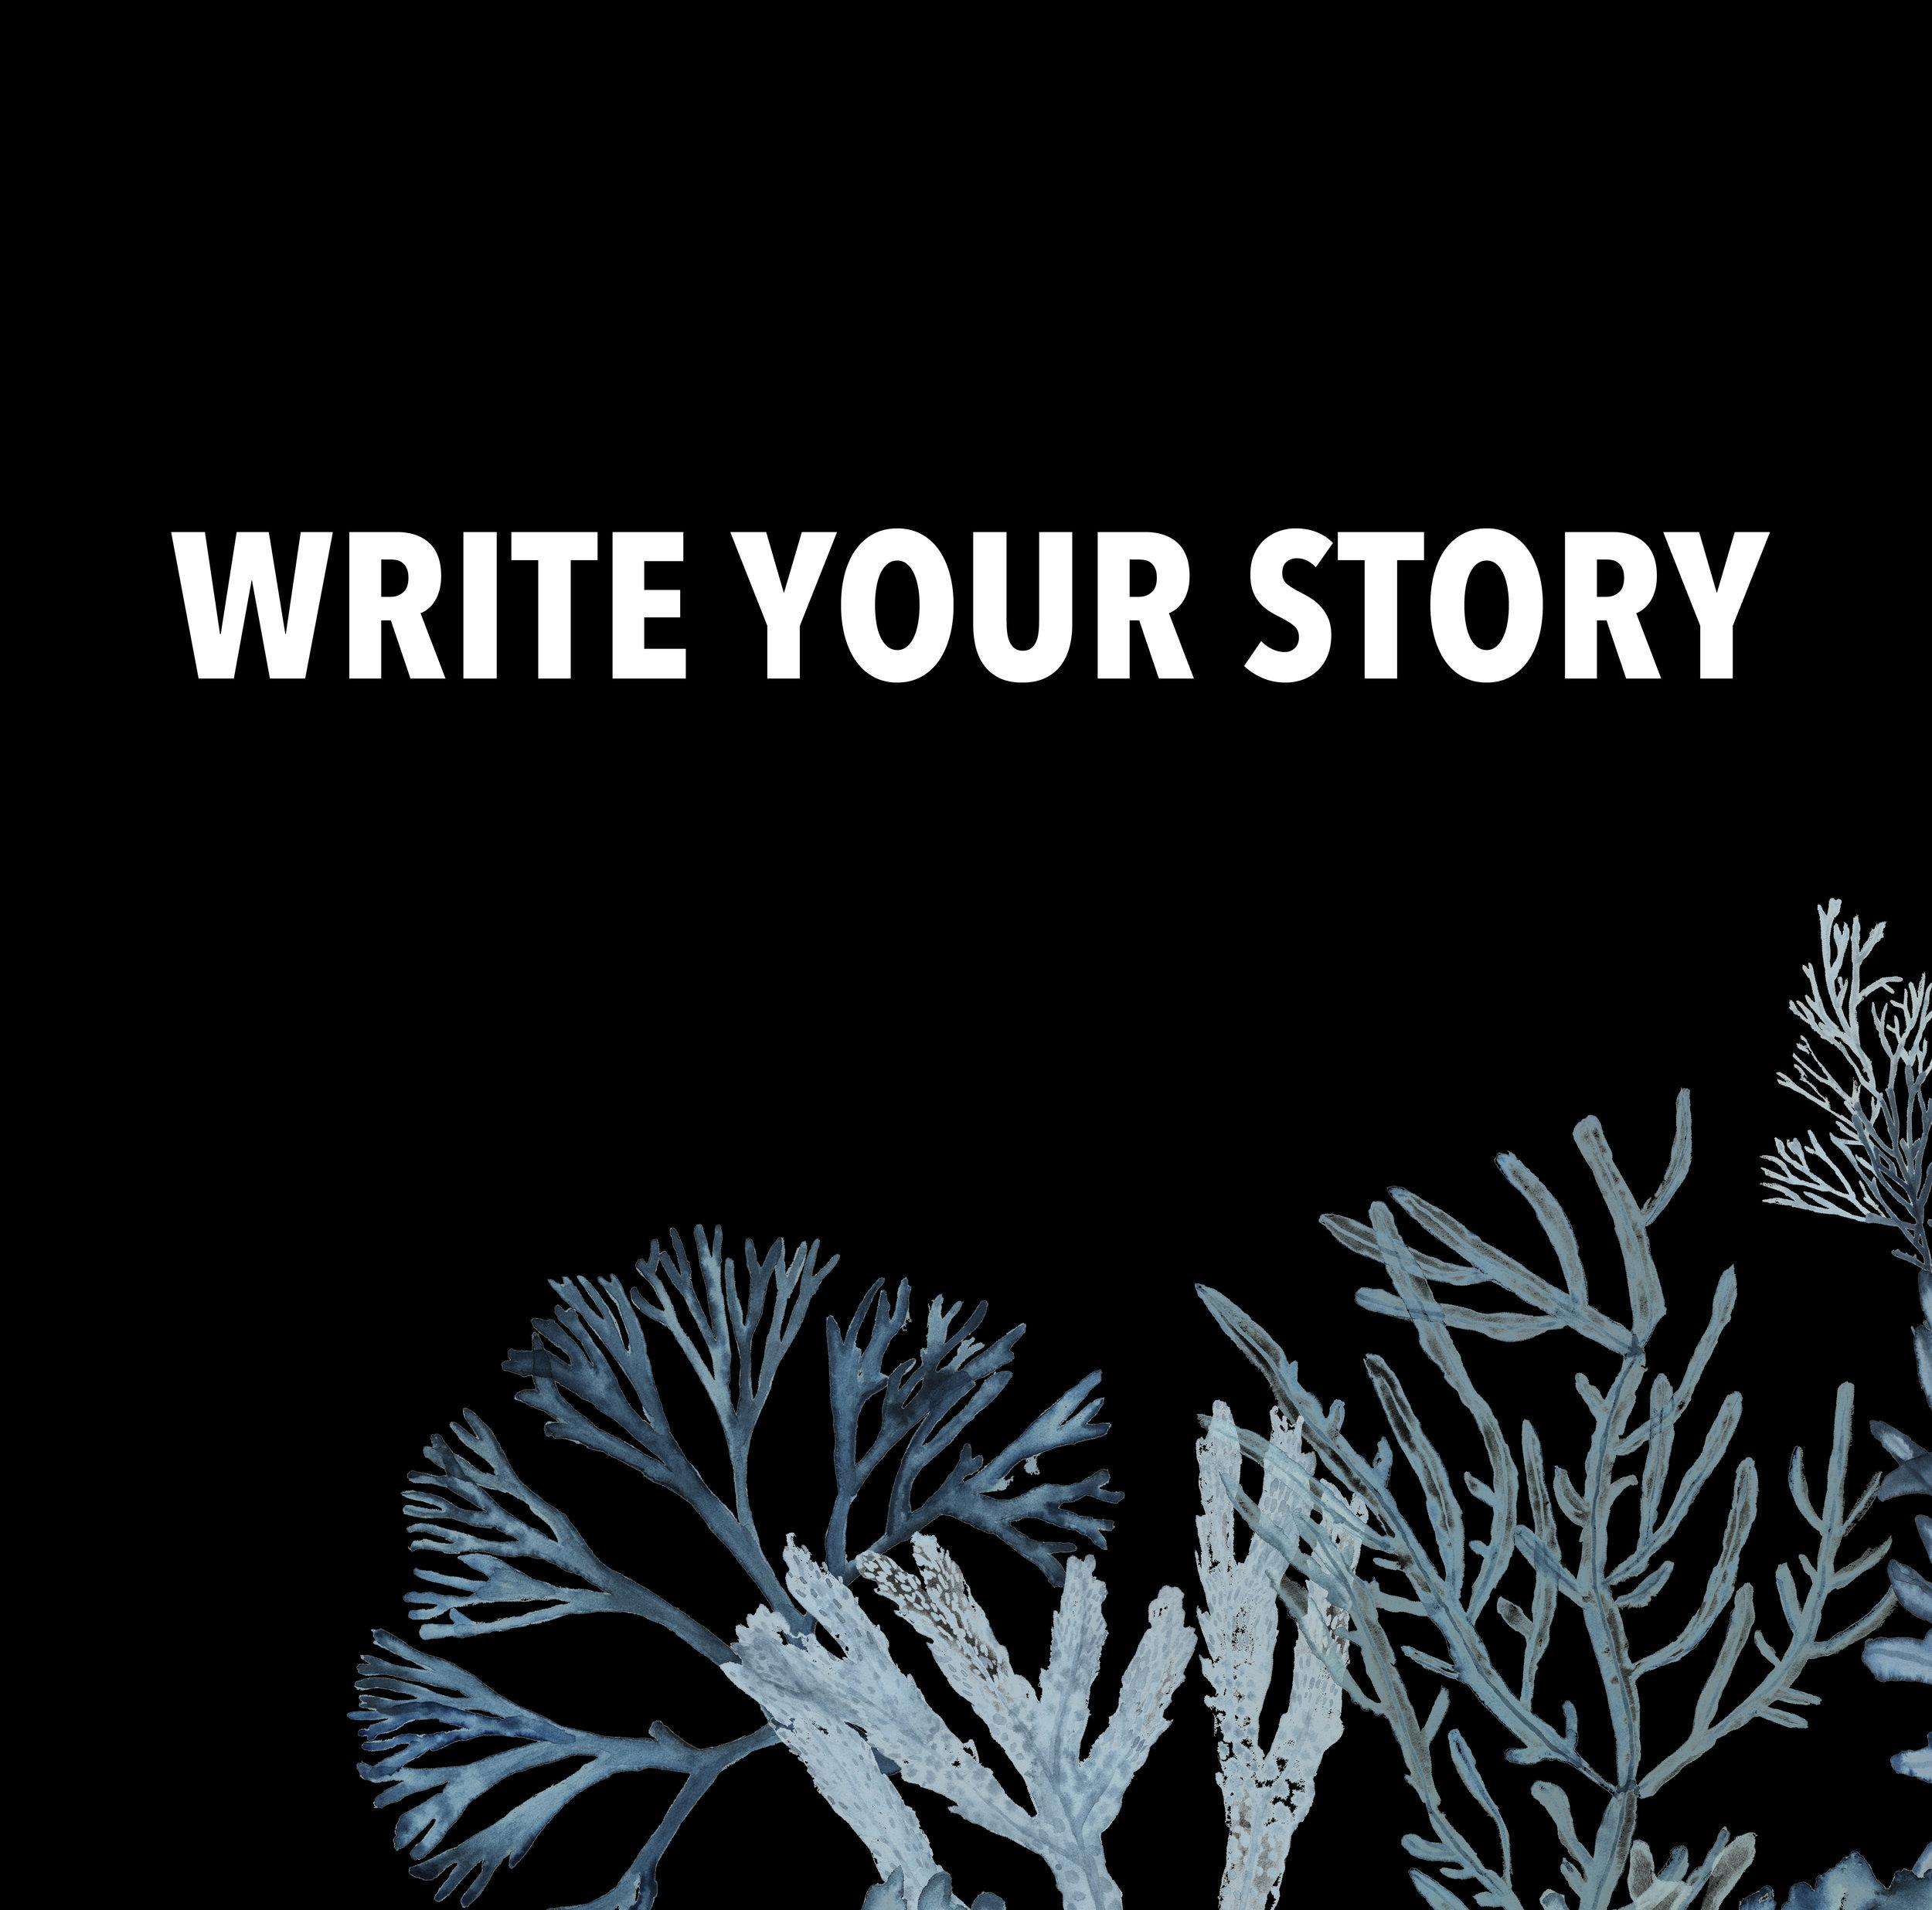 Write_Tell_Live_Images-04.jpg